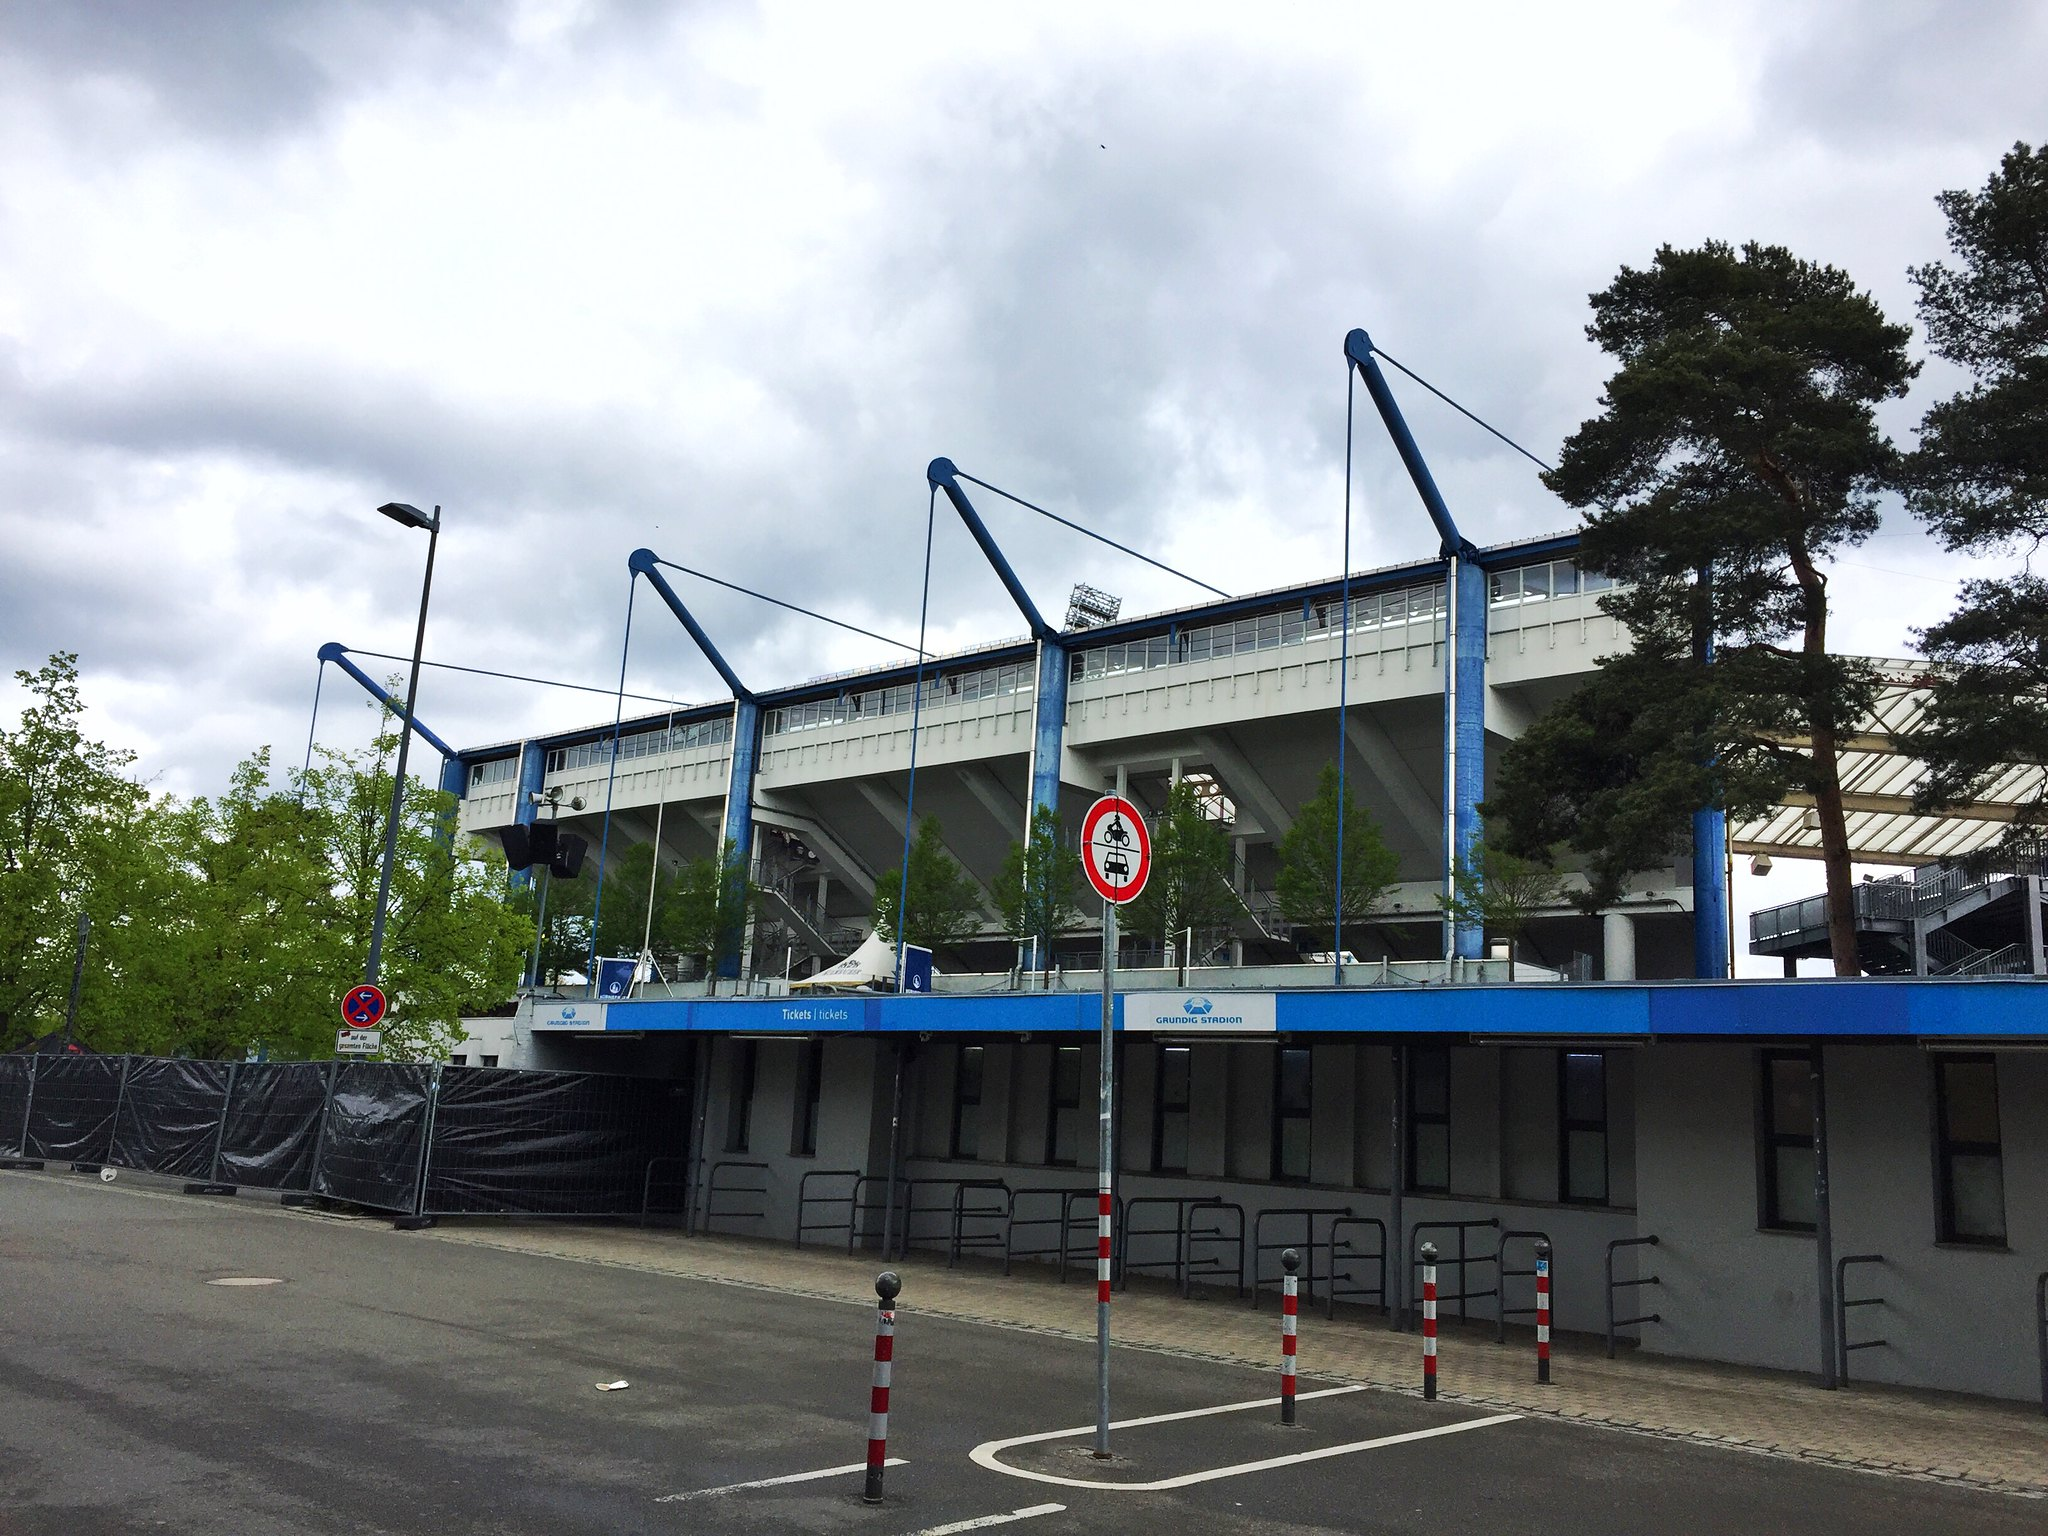 2017-05-07 - Frankenstadion #nbglove